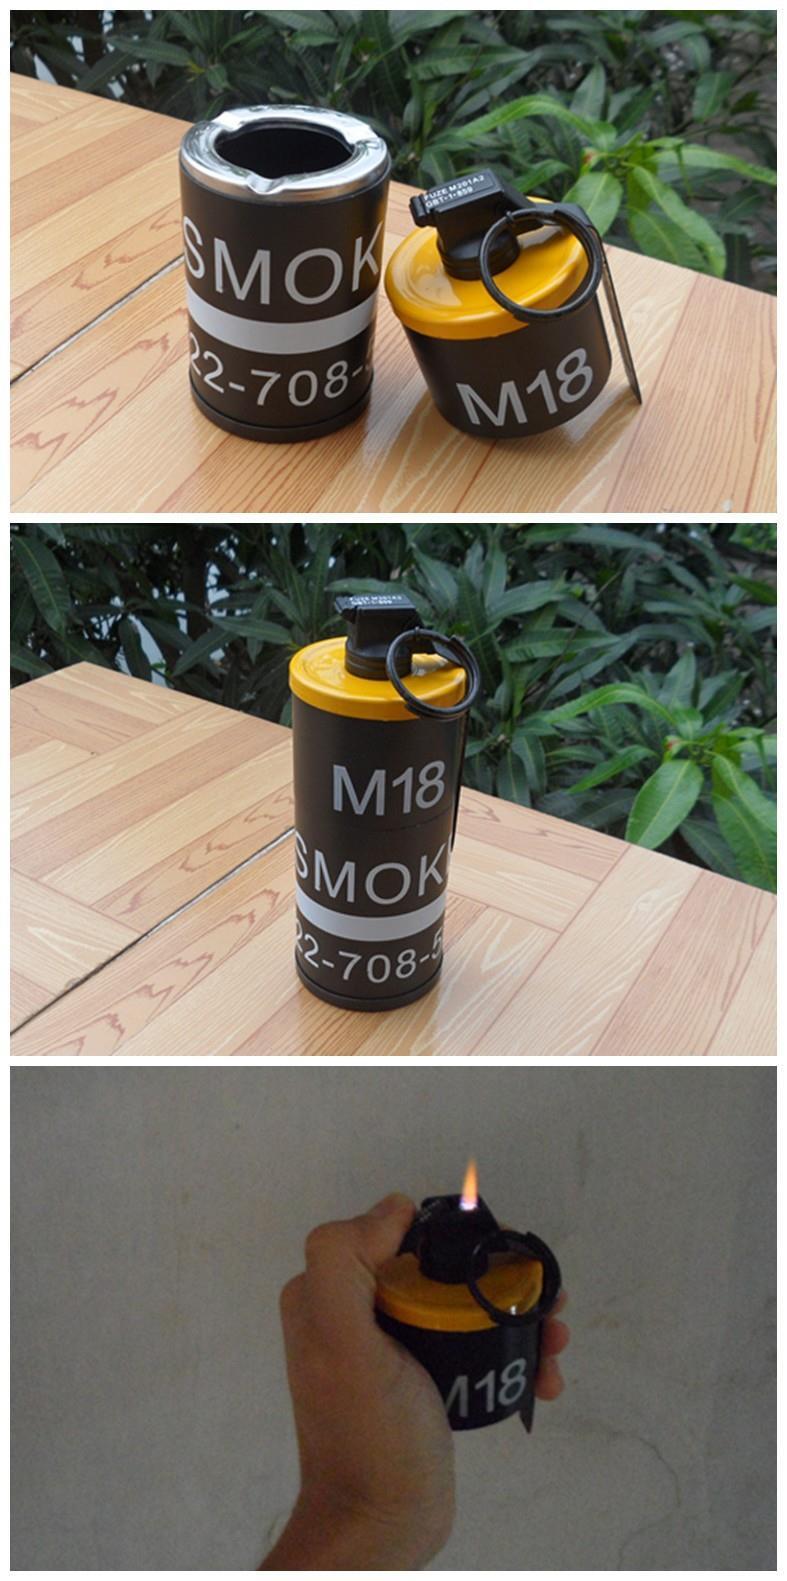 DUMMY M18 Smoke Grenade shape Ashtray Windproof lighter